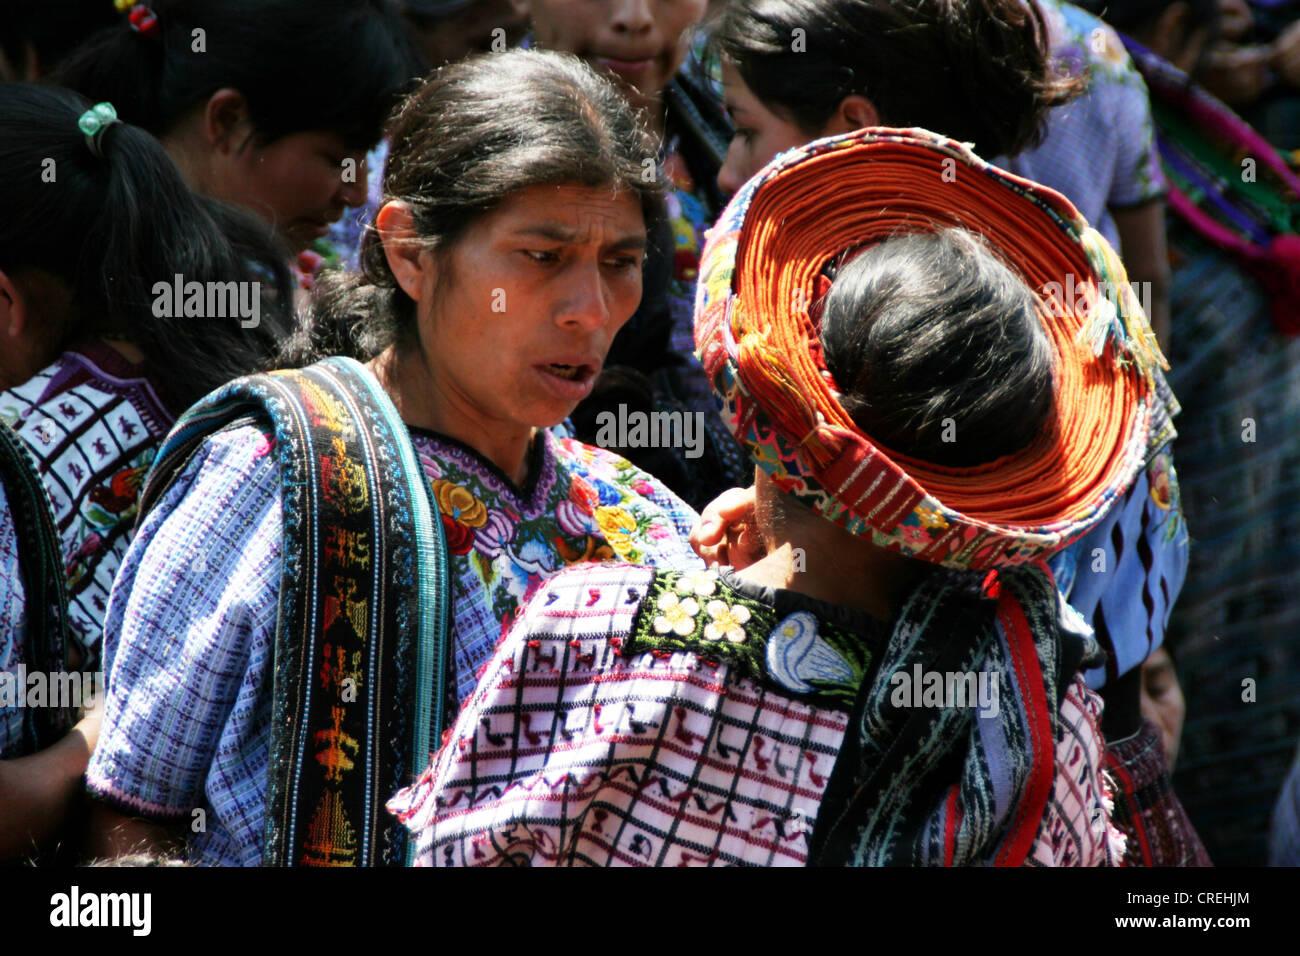 Maya woman with typical head covering from Santiago de Atitlan, Guatemala, Atitlansee, Santiago de Atitlan - Stock Image